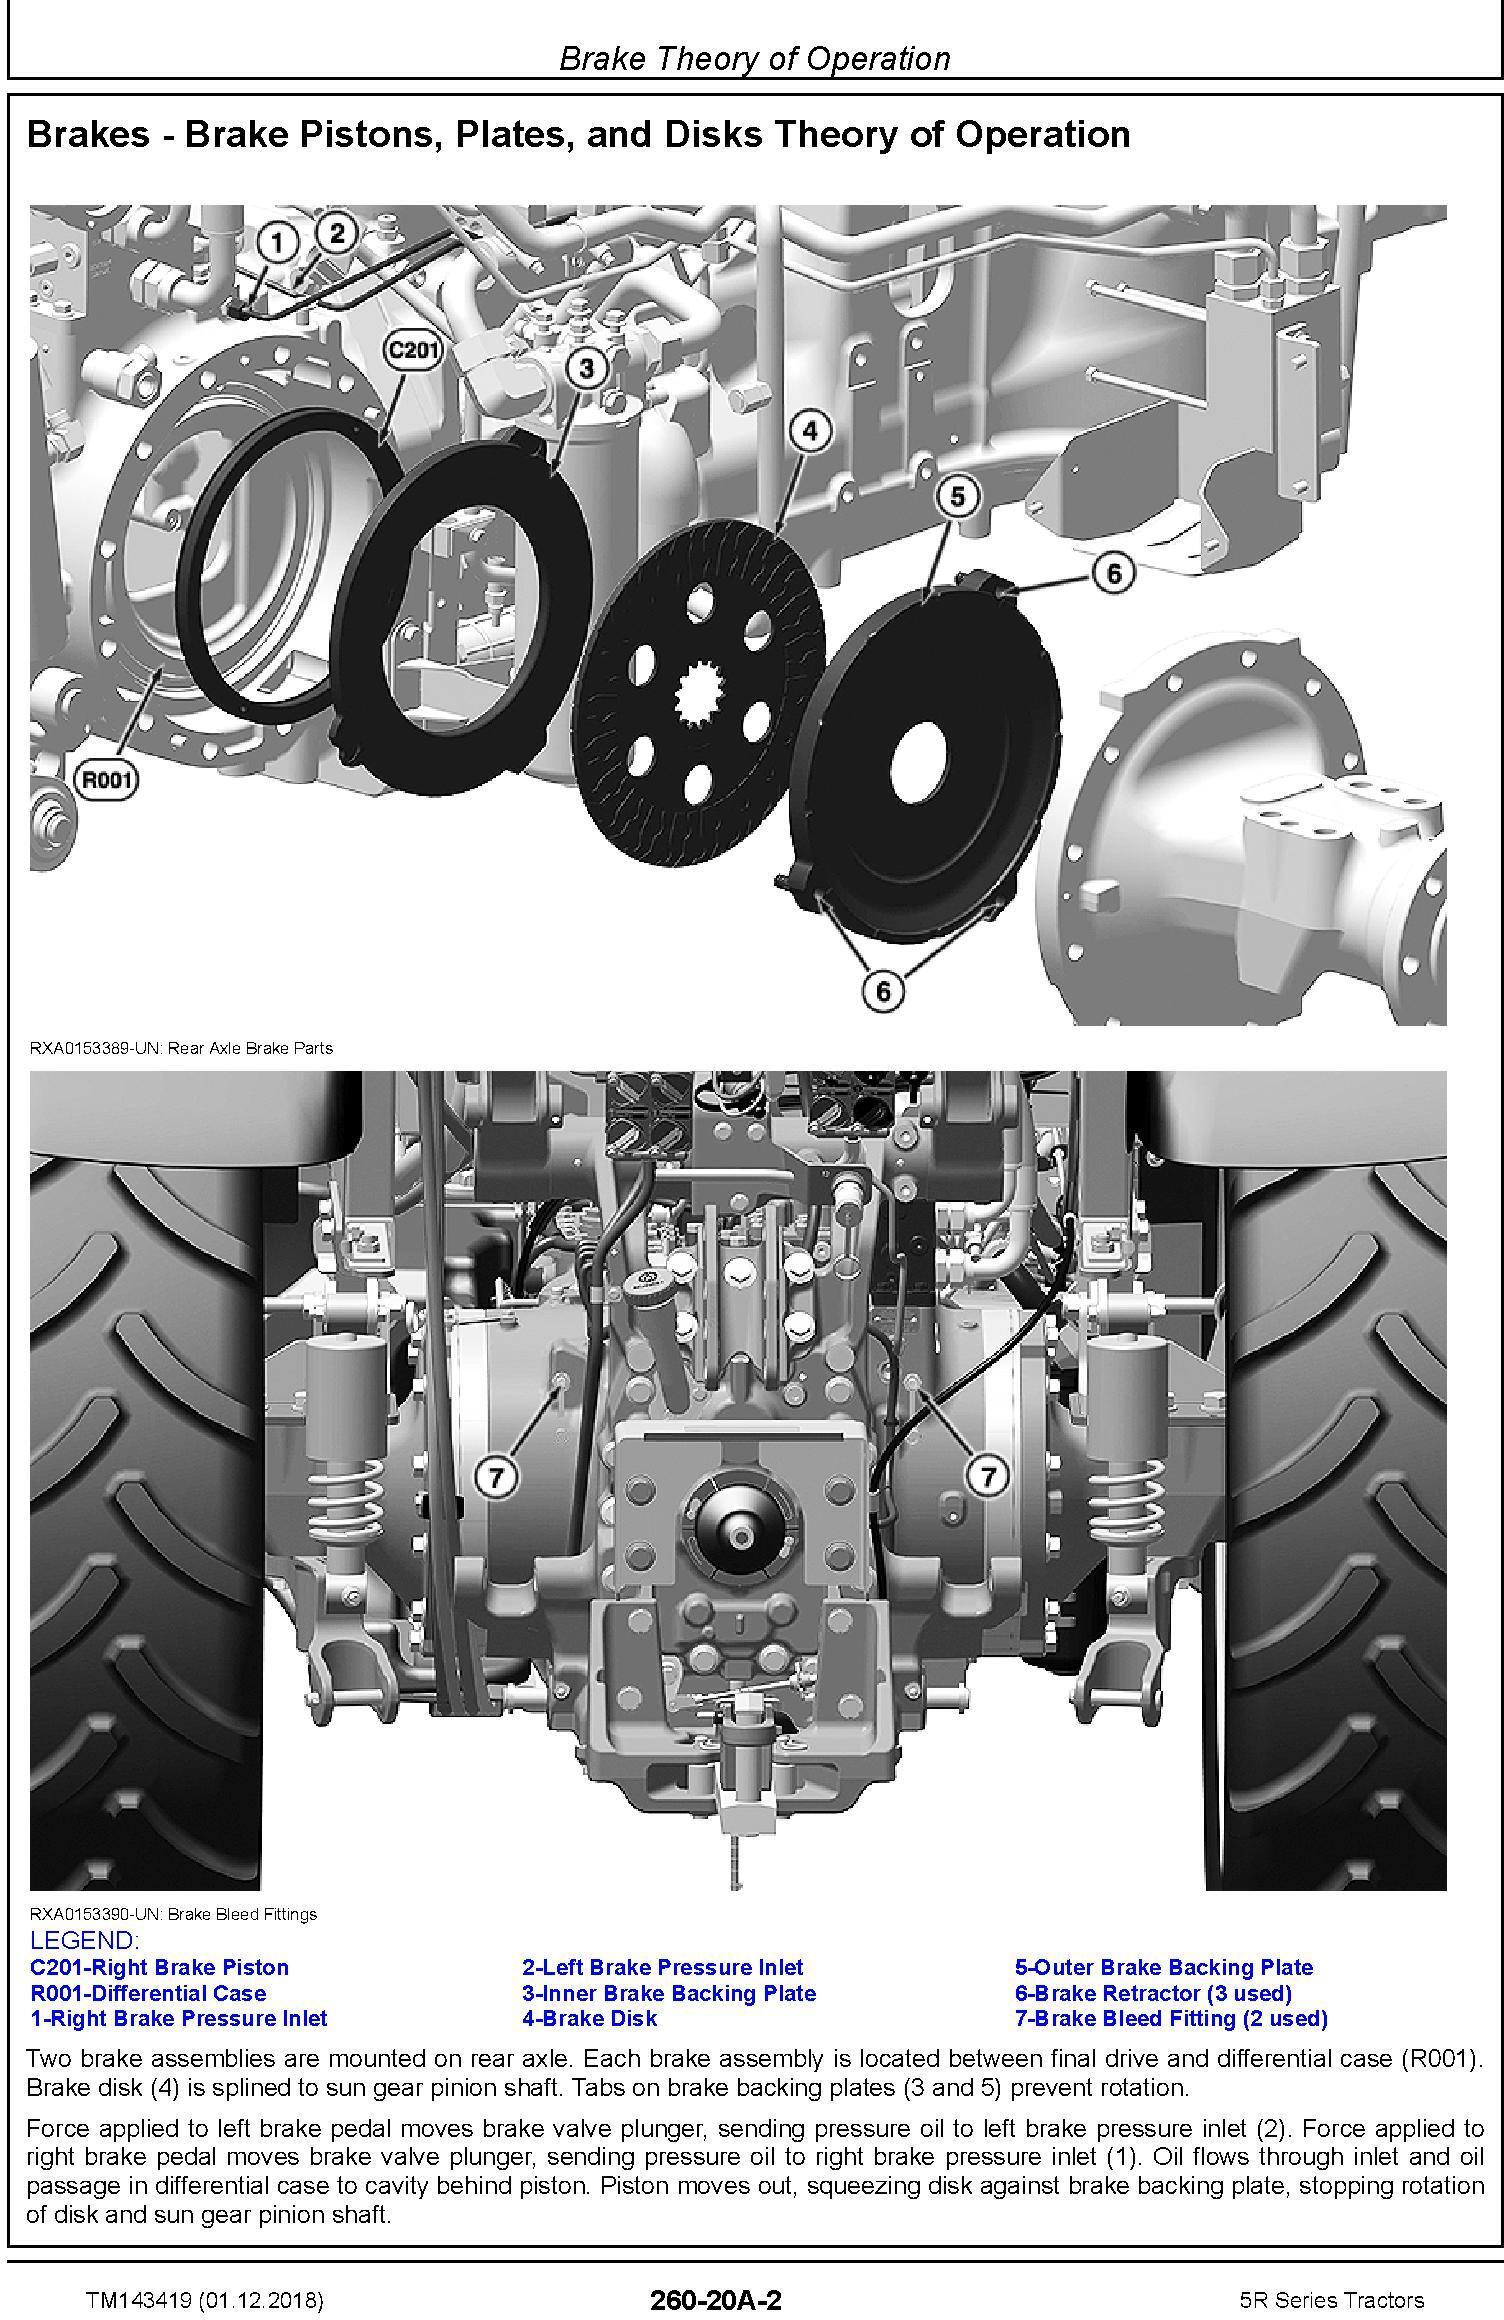 John Deere 5090R, 5100R, 5115R, 5115RH,5125R Tractors Diagnostic Technical Service Manual (TM143419) - 1